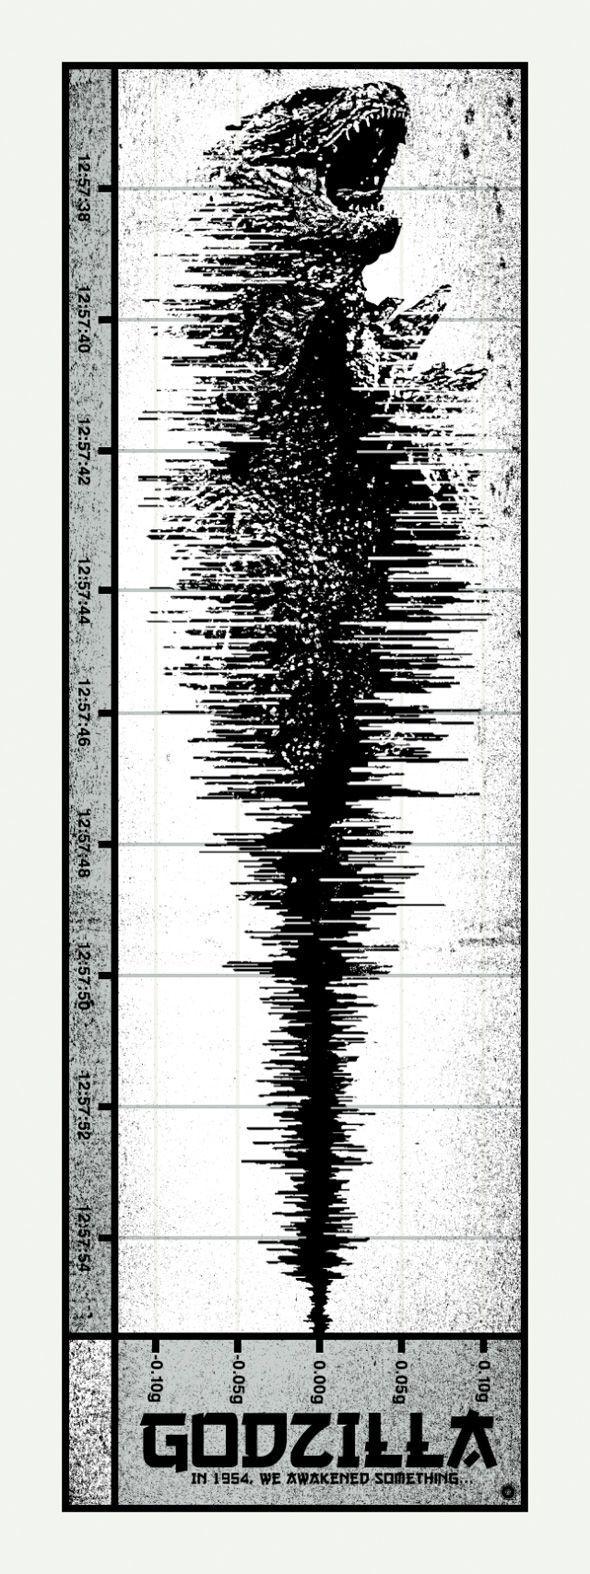 godzilla print in 1954 we awakened something heisei edition chris garofalo - Godzilla Pictures To Print